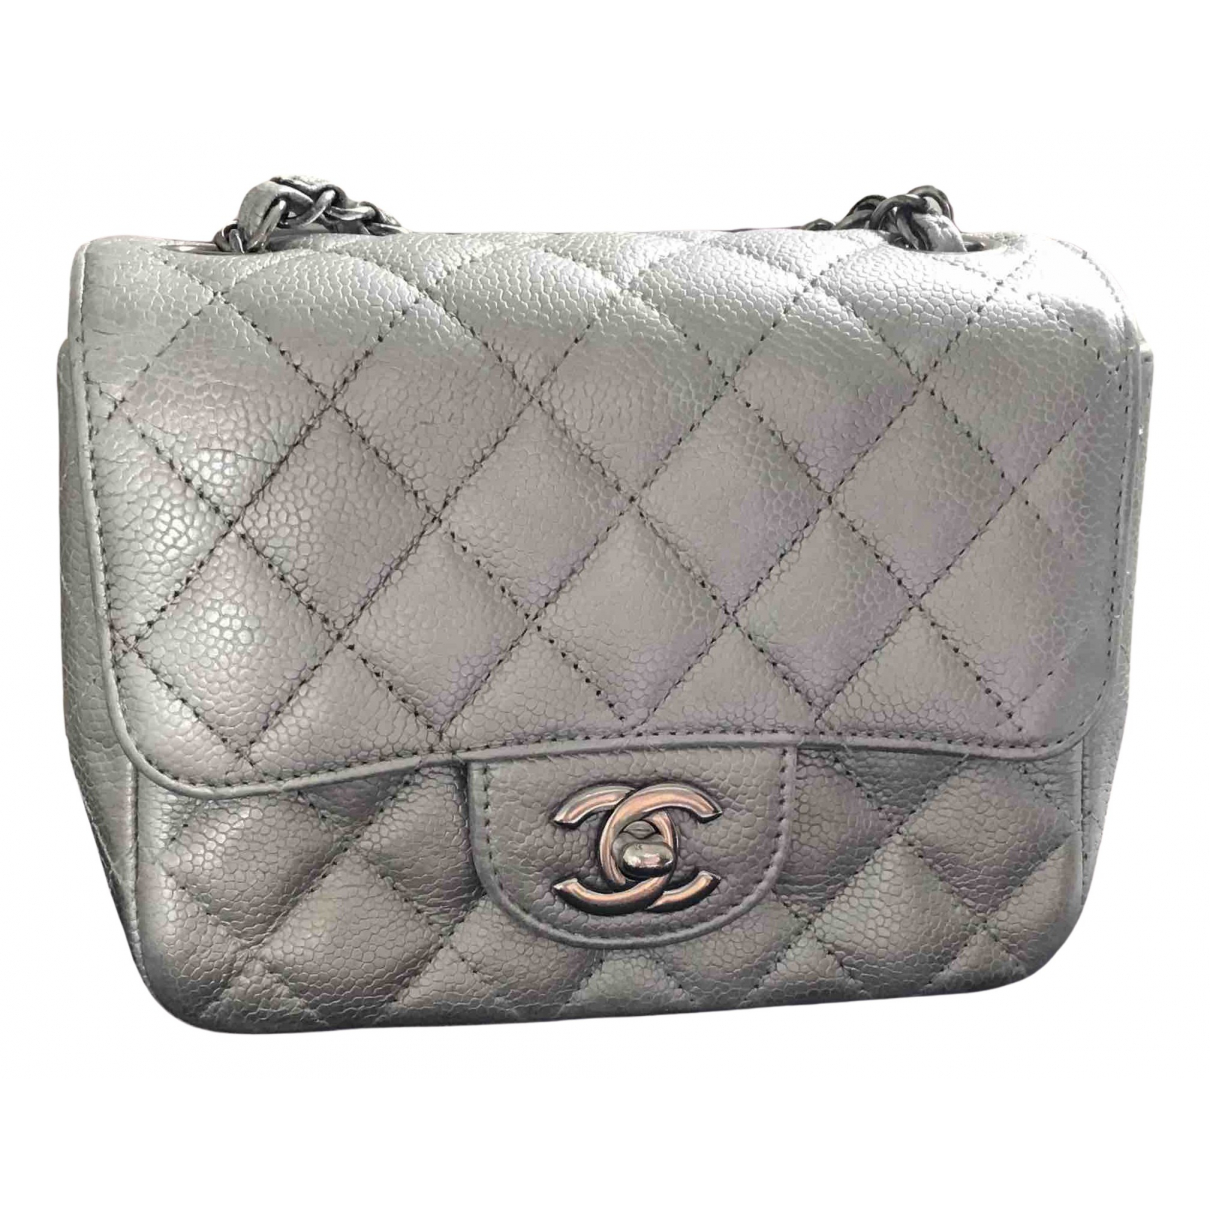 Chanel Timeless/Classique Handtasche in  Silber Leder